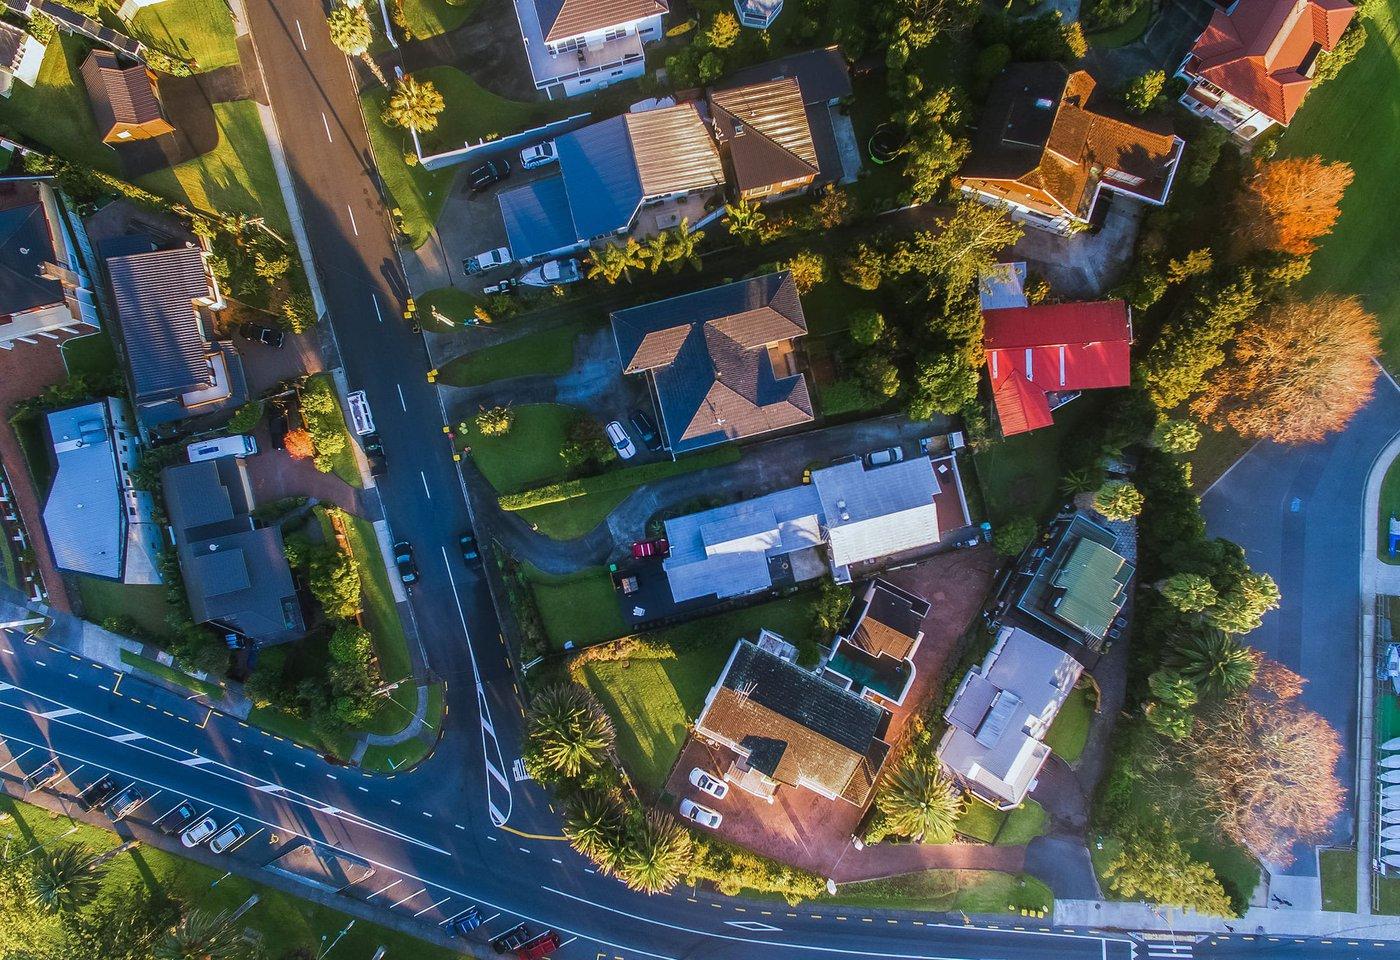 qv-drone_CtLKhPV.original.jpg